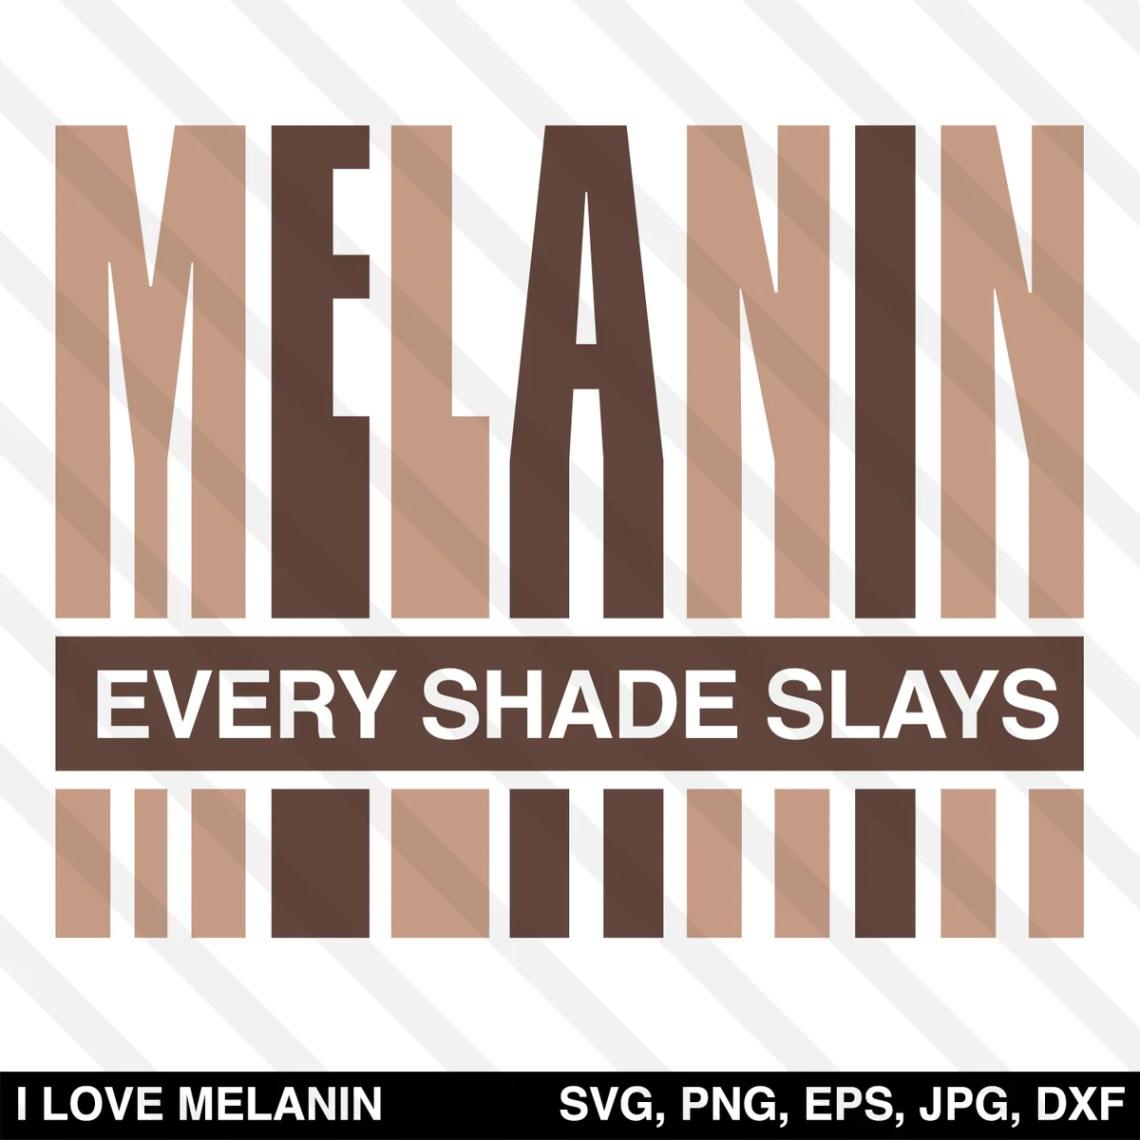 Download Melanin Every Shade Slays SVG - I Love Melanin